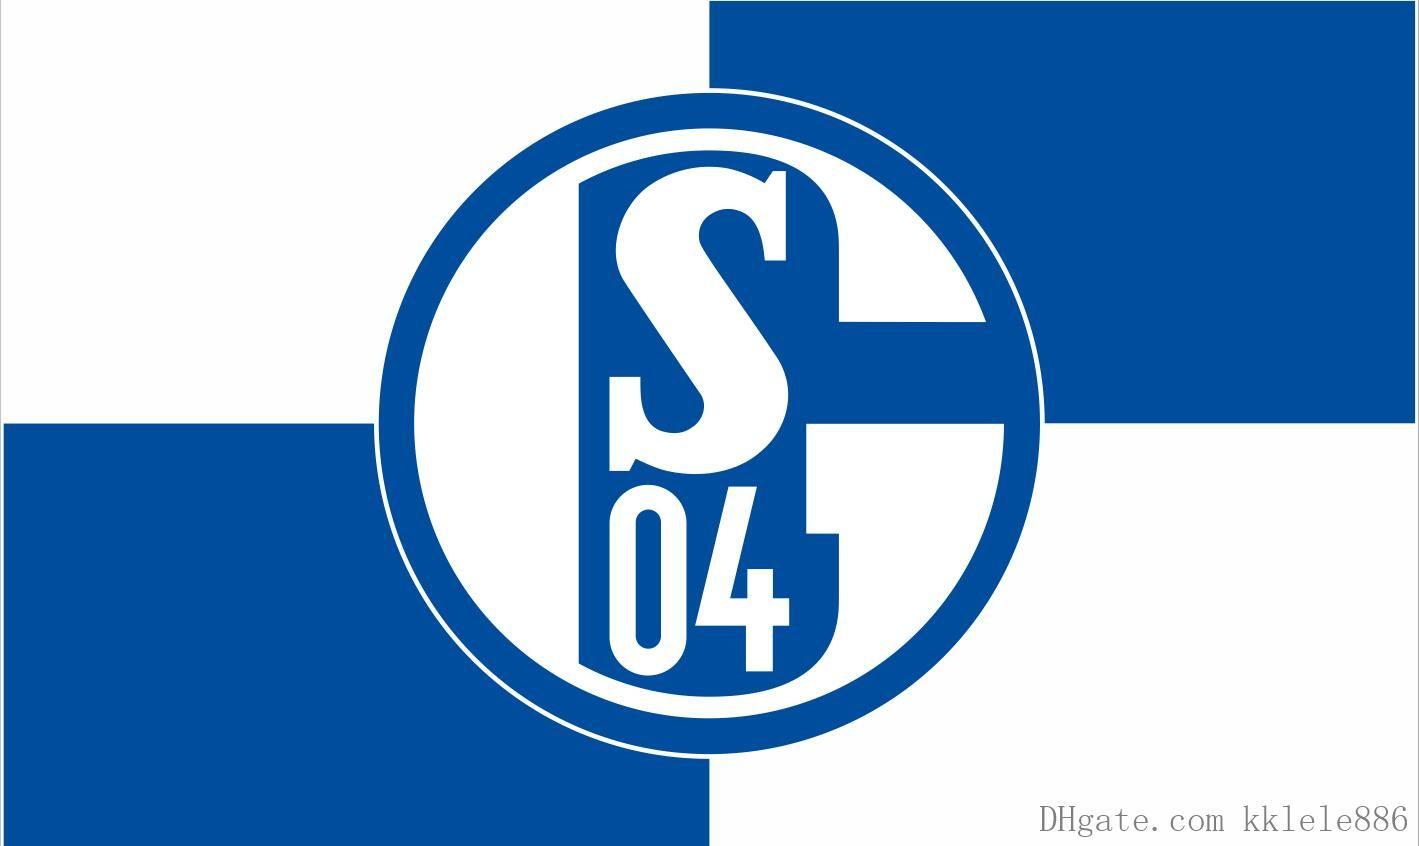 2021 Fc Schalke 04 Flag 90 X 150 Cm Polyester S04 German Football Club Sports Banner From Kklele886 6 04 Dhgate Com